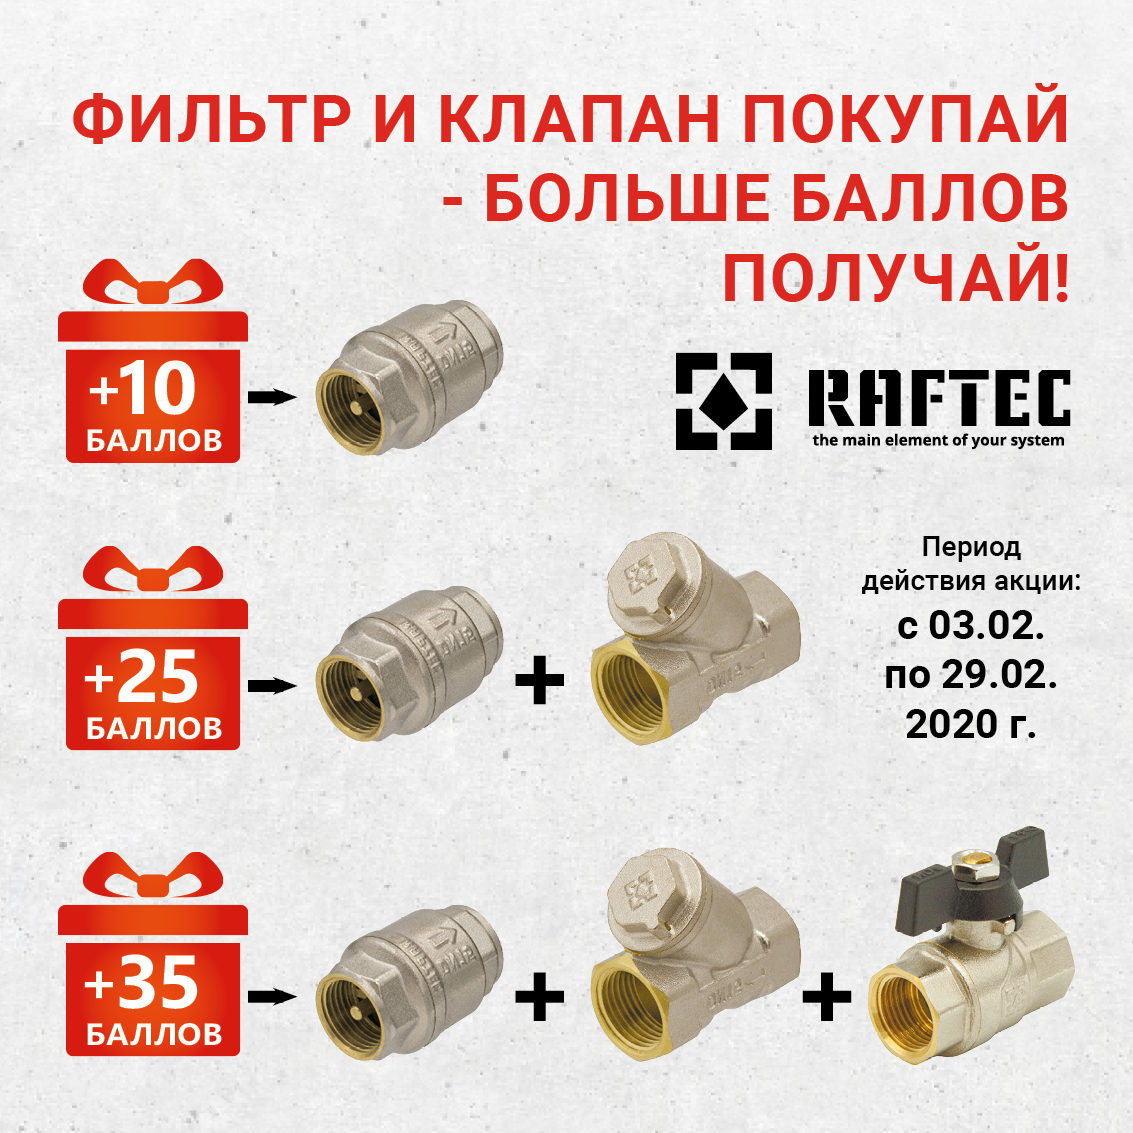 Banner_akciya_Raftec_safe_850x850px_2